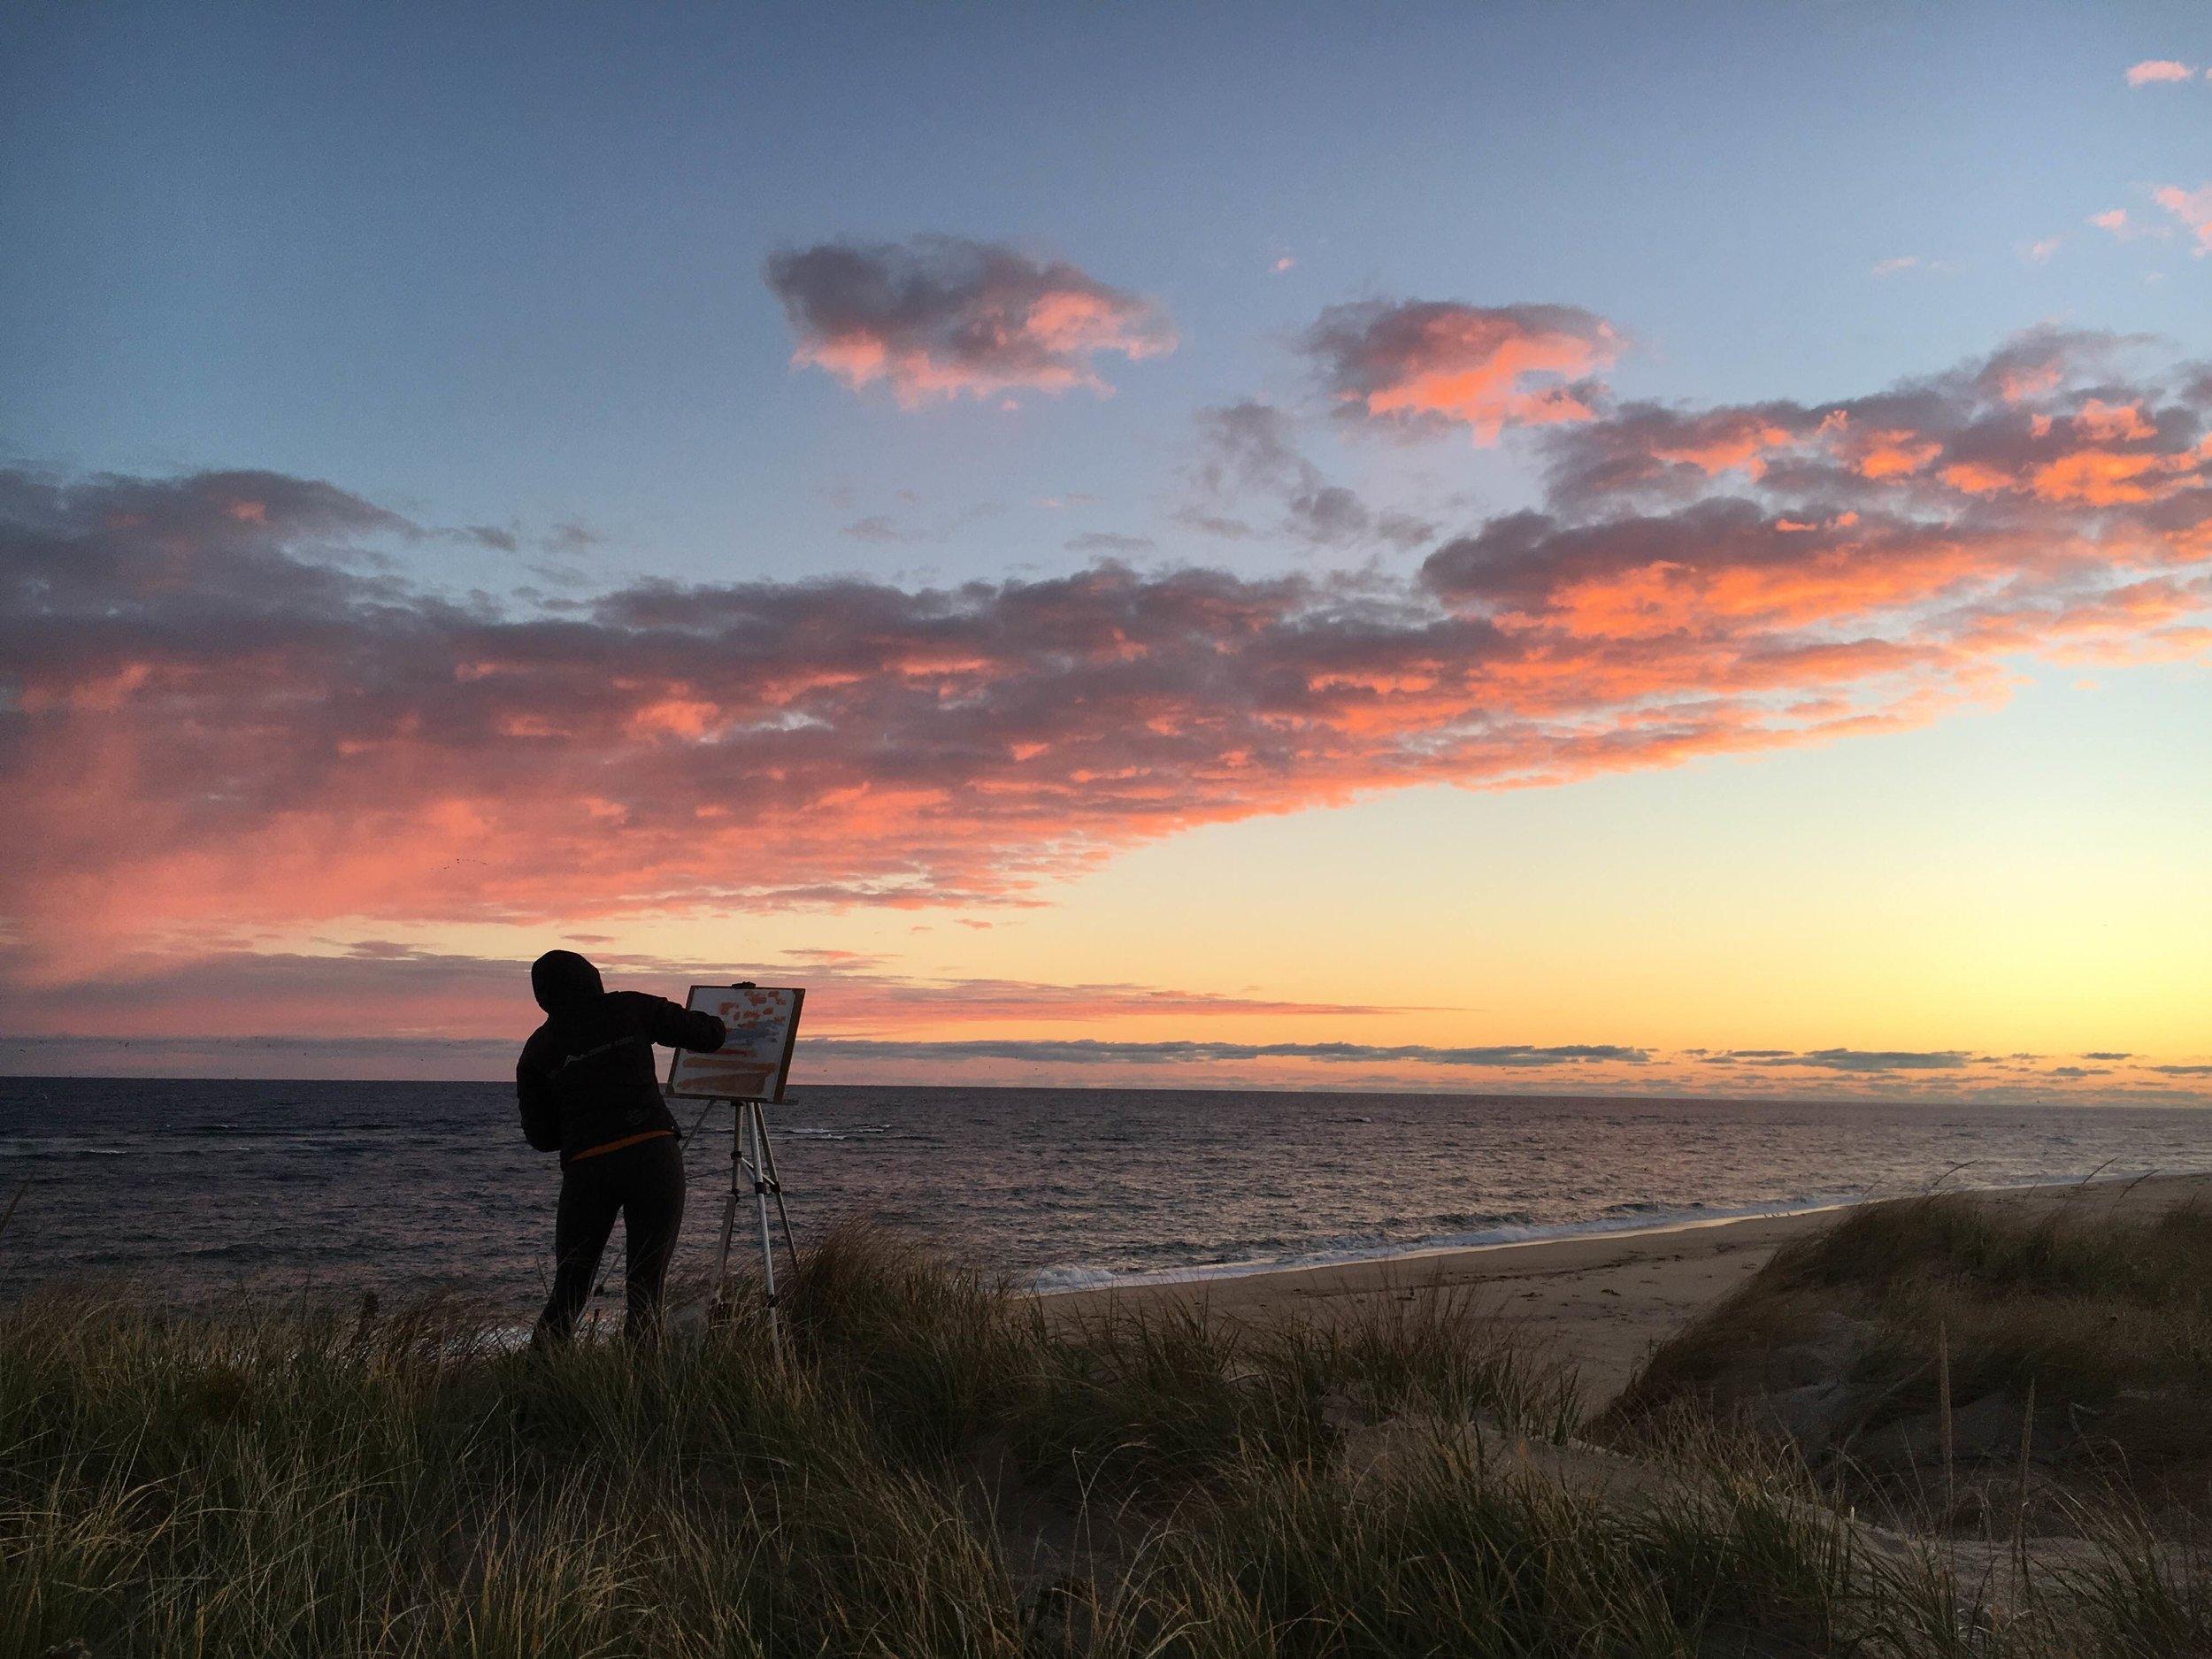 Sunrise, National Seashore Artist Residency, North Truro, Massachusetts 2016